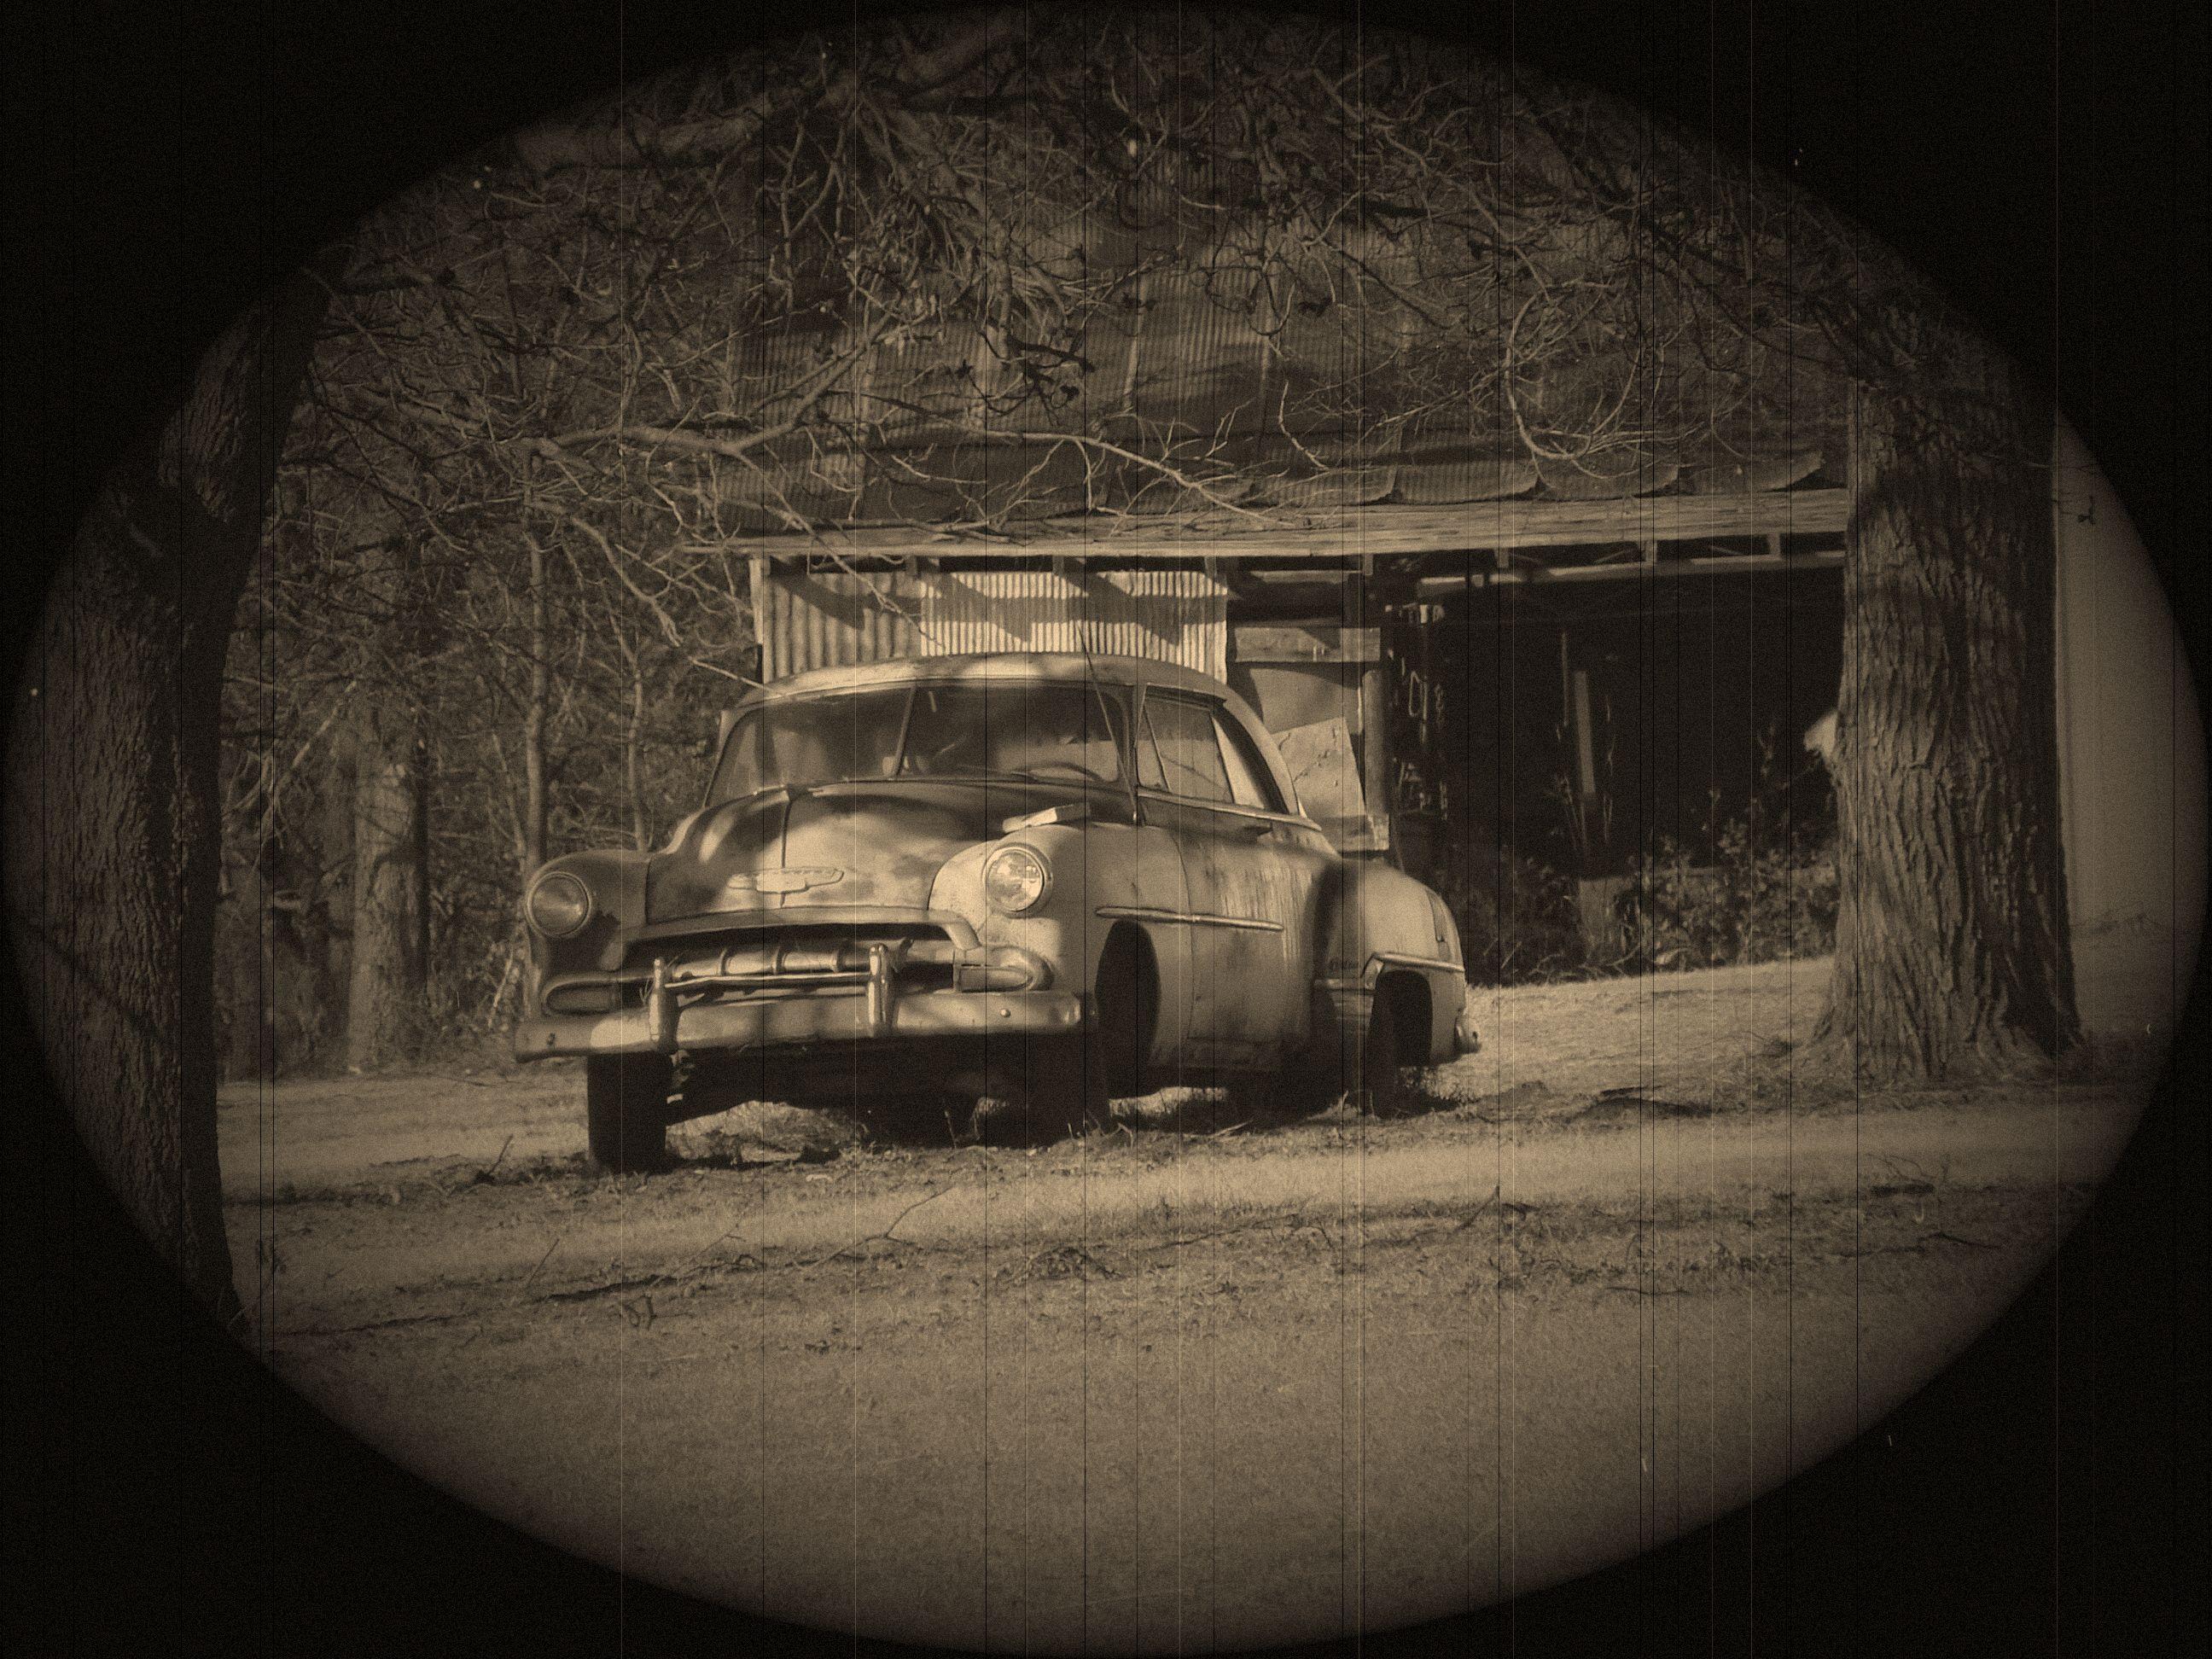 Timeless, Antique, Auto, Bspo06, Car, HQ Photo